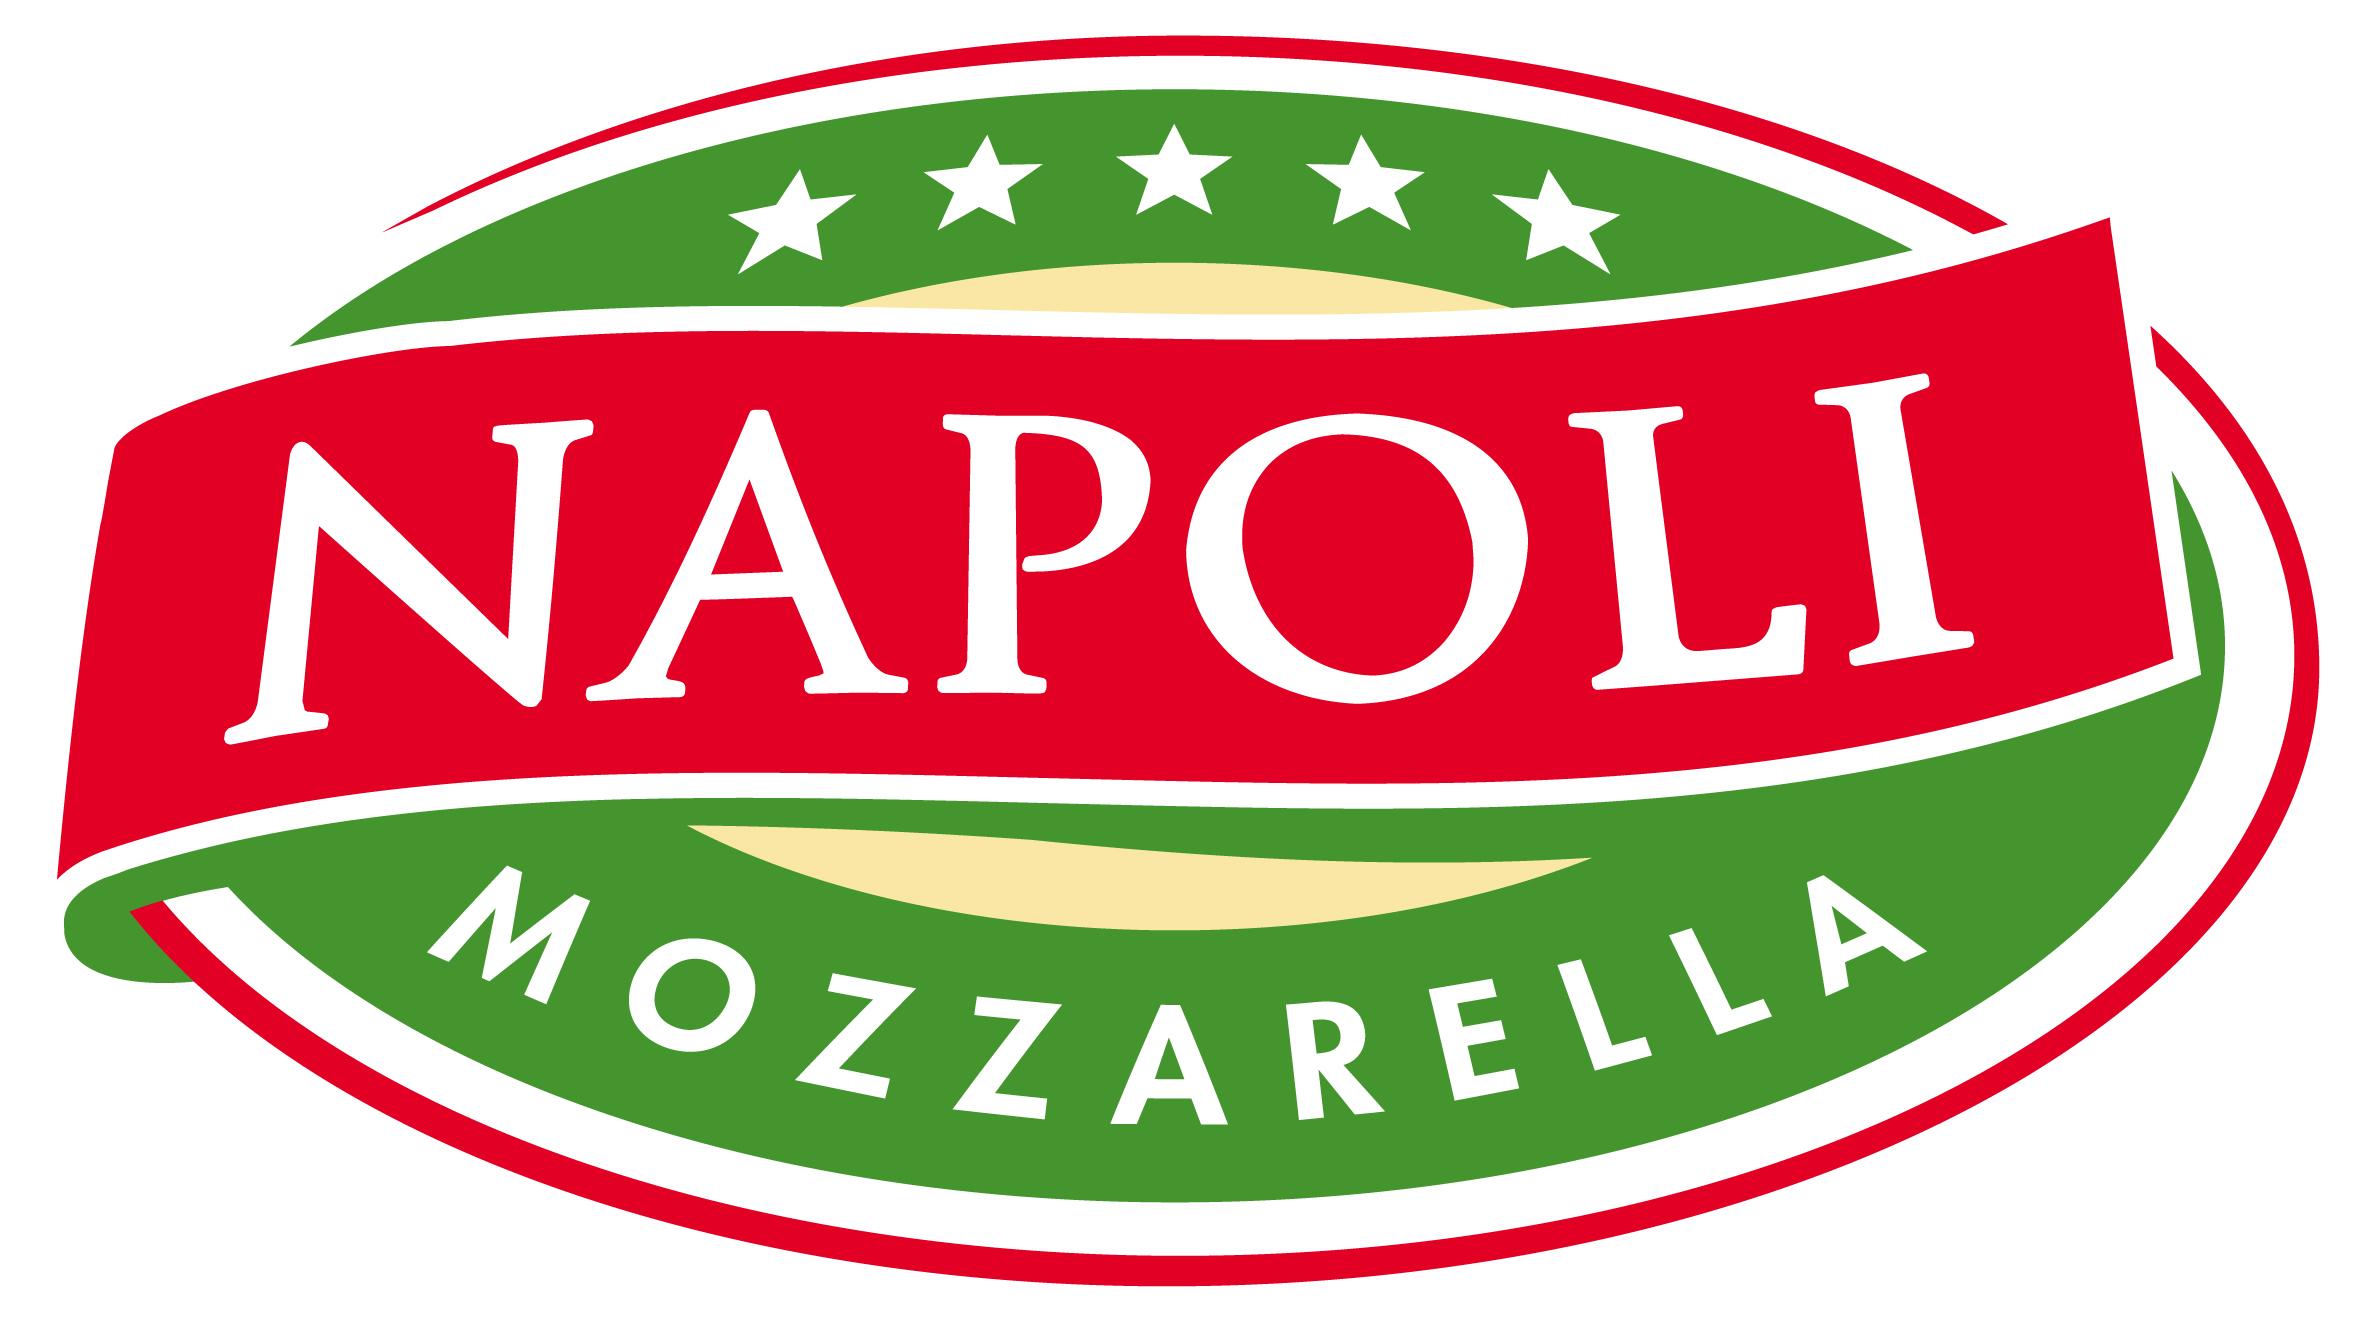 Quesera Napoli